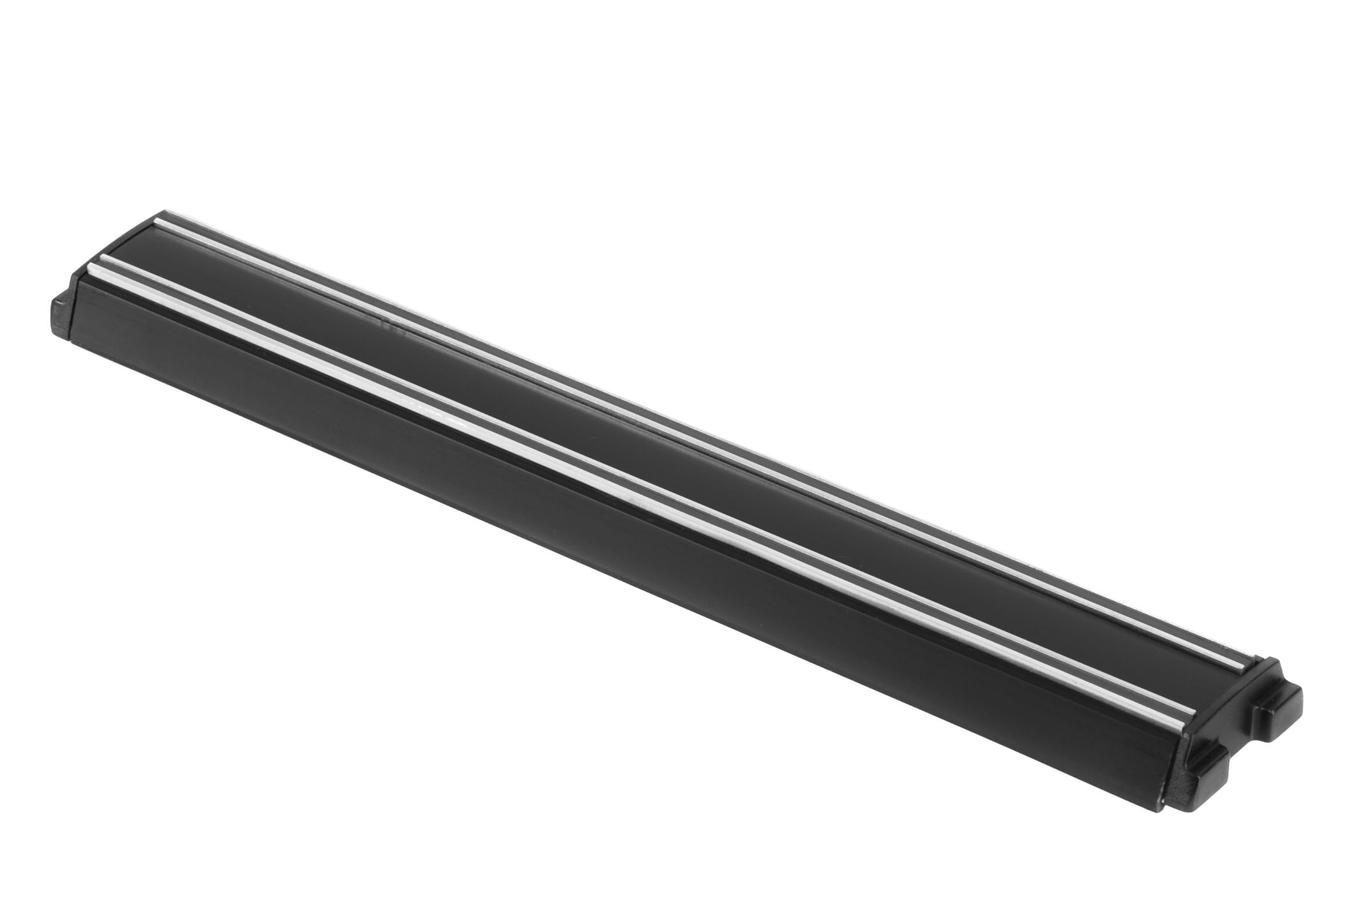 couteau zwilling barre magnetique 32621 300 0 1356160 darty. Black Bedroom Furniture Sets. Home Design Ideas